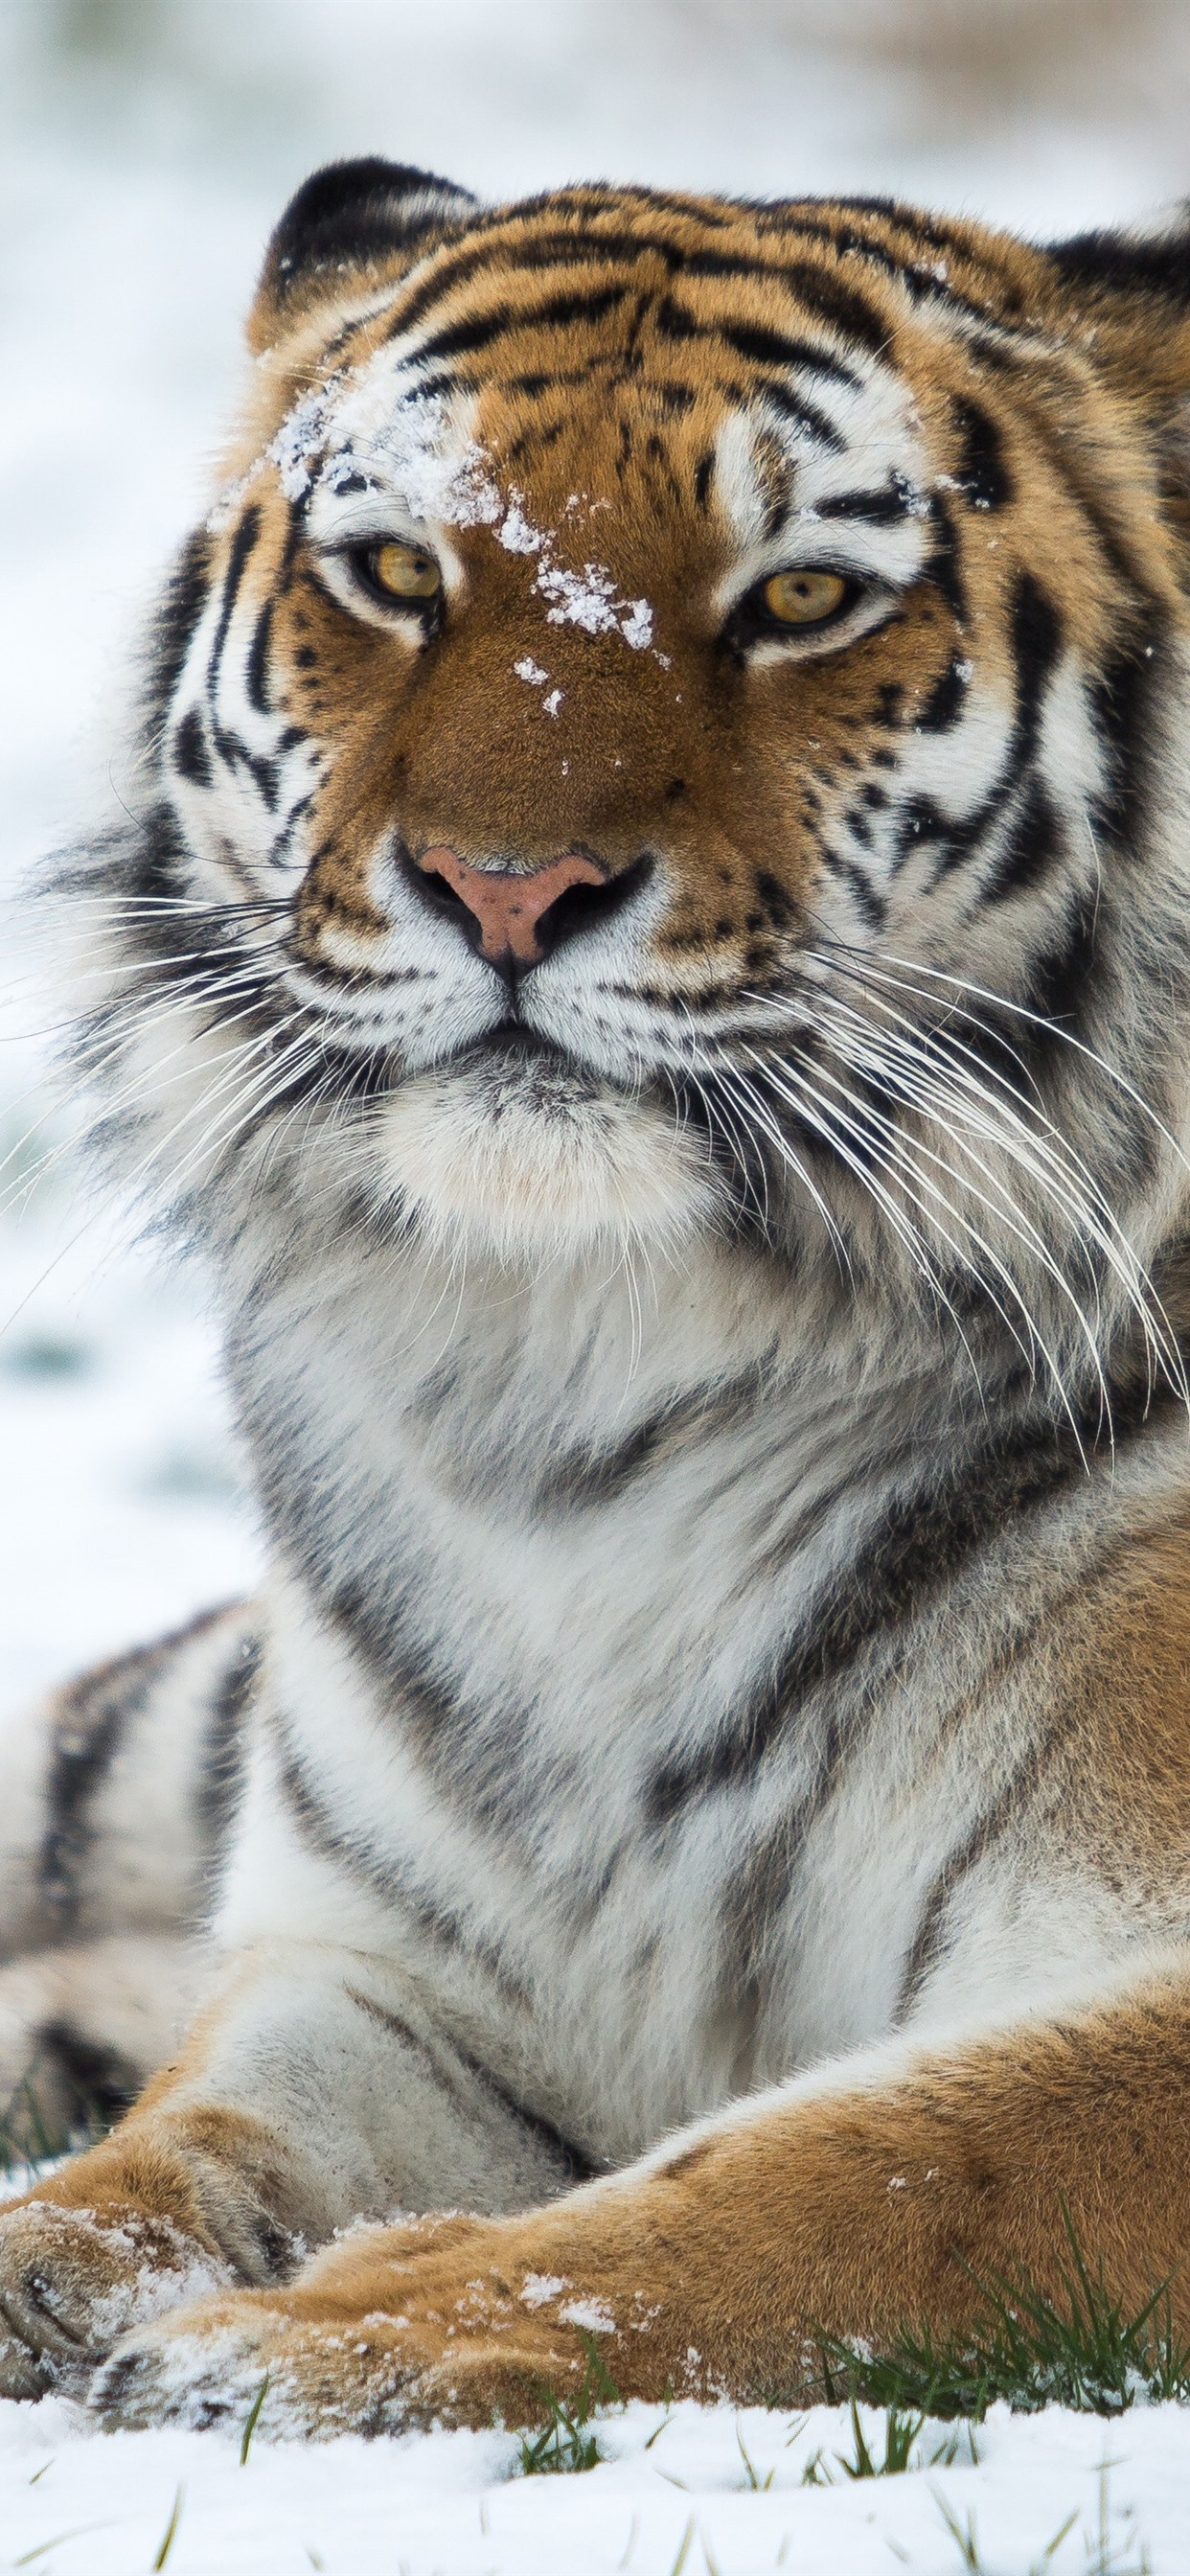 Tiger, wildlife, snow, winter 1242x2688 iPhone XS Max